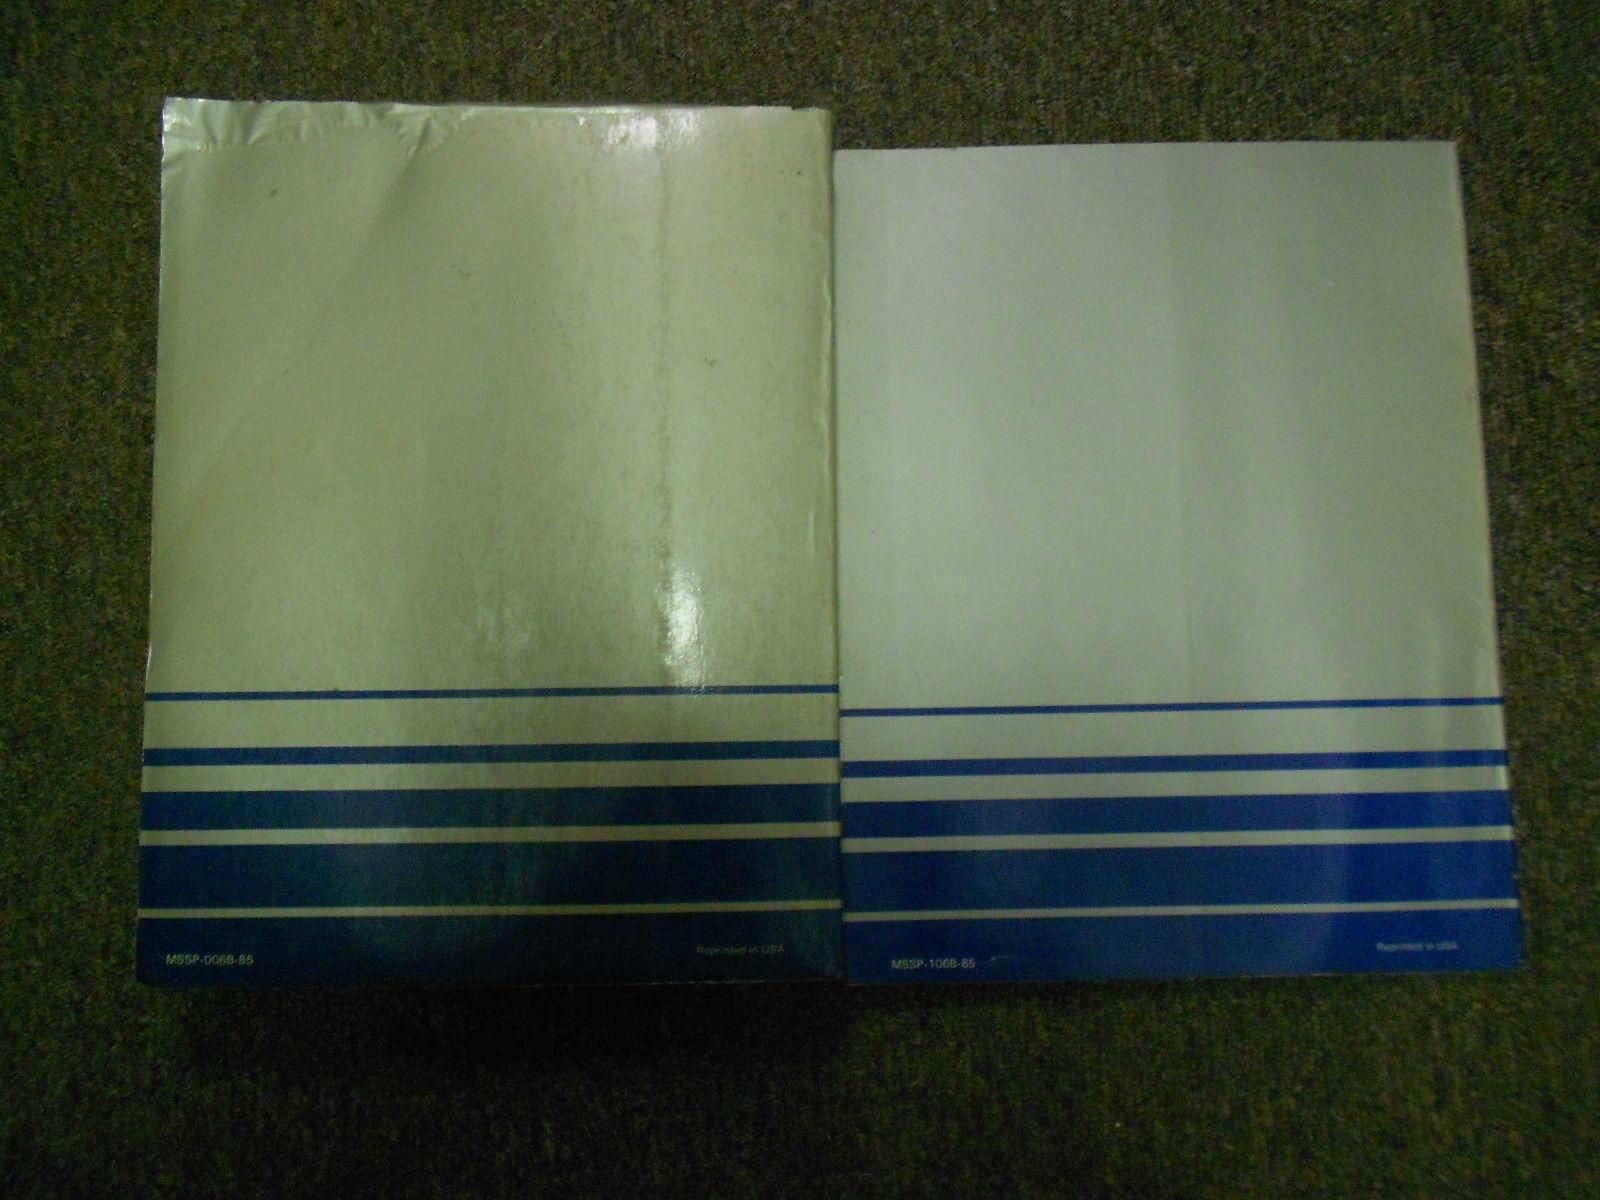 1985 MITSUBISHI Mirage Service Repair Shop Manual 2 VOL SET OEM BOOK 85 FACTORY